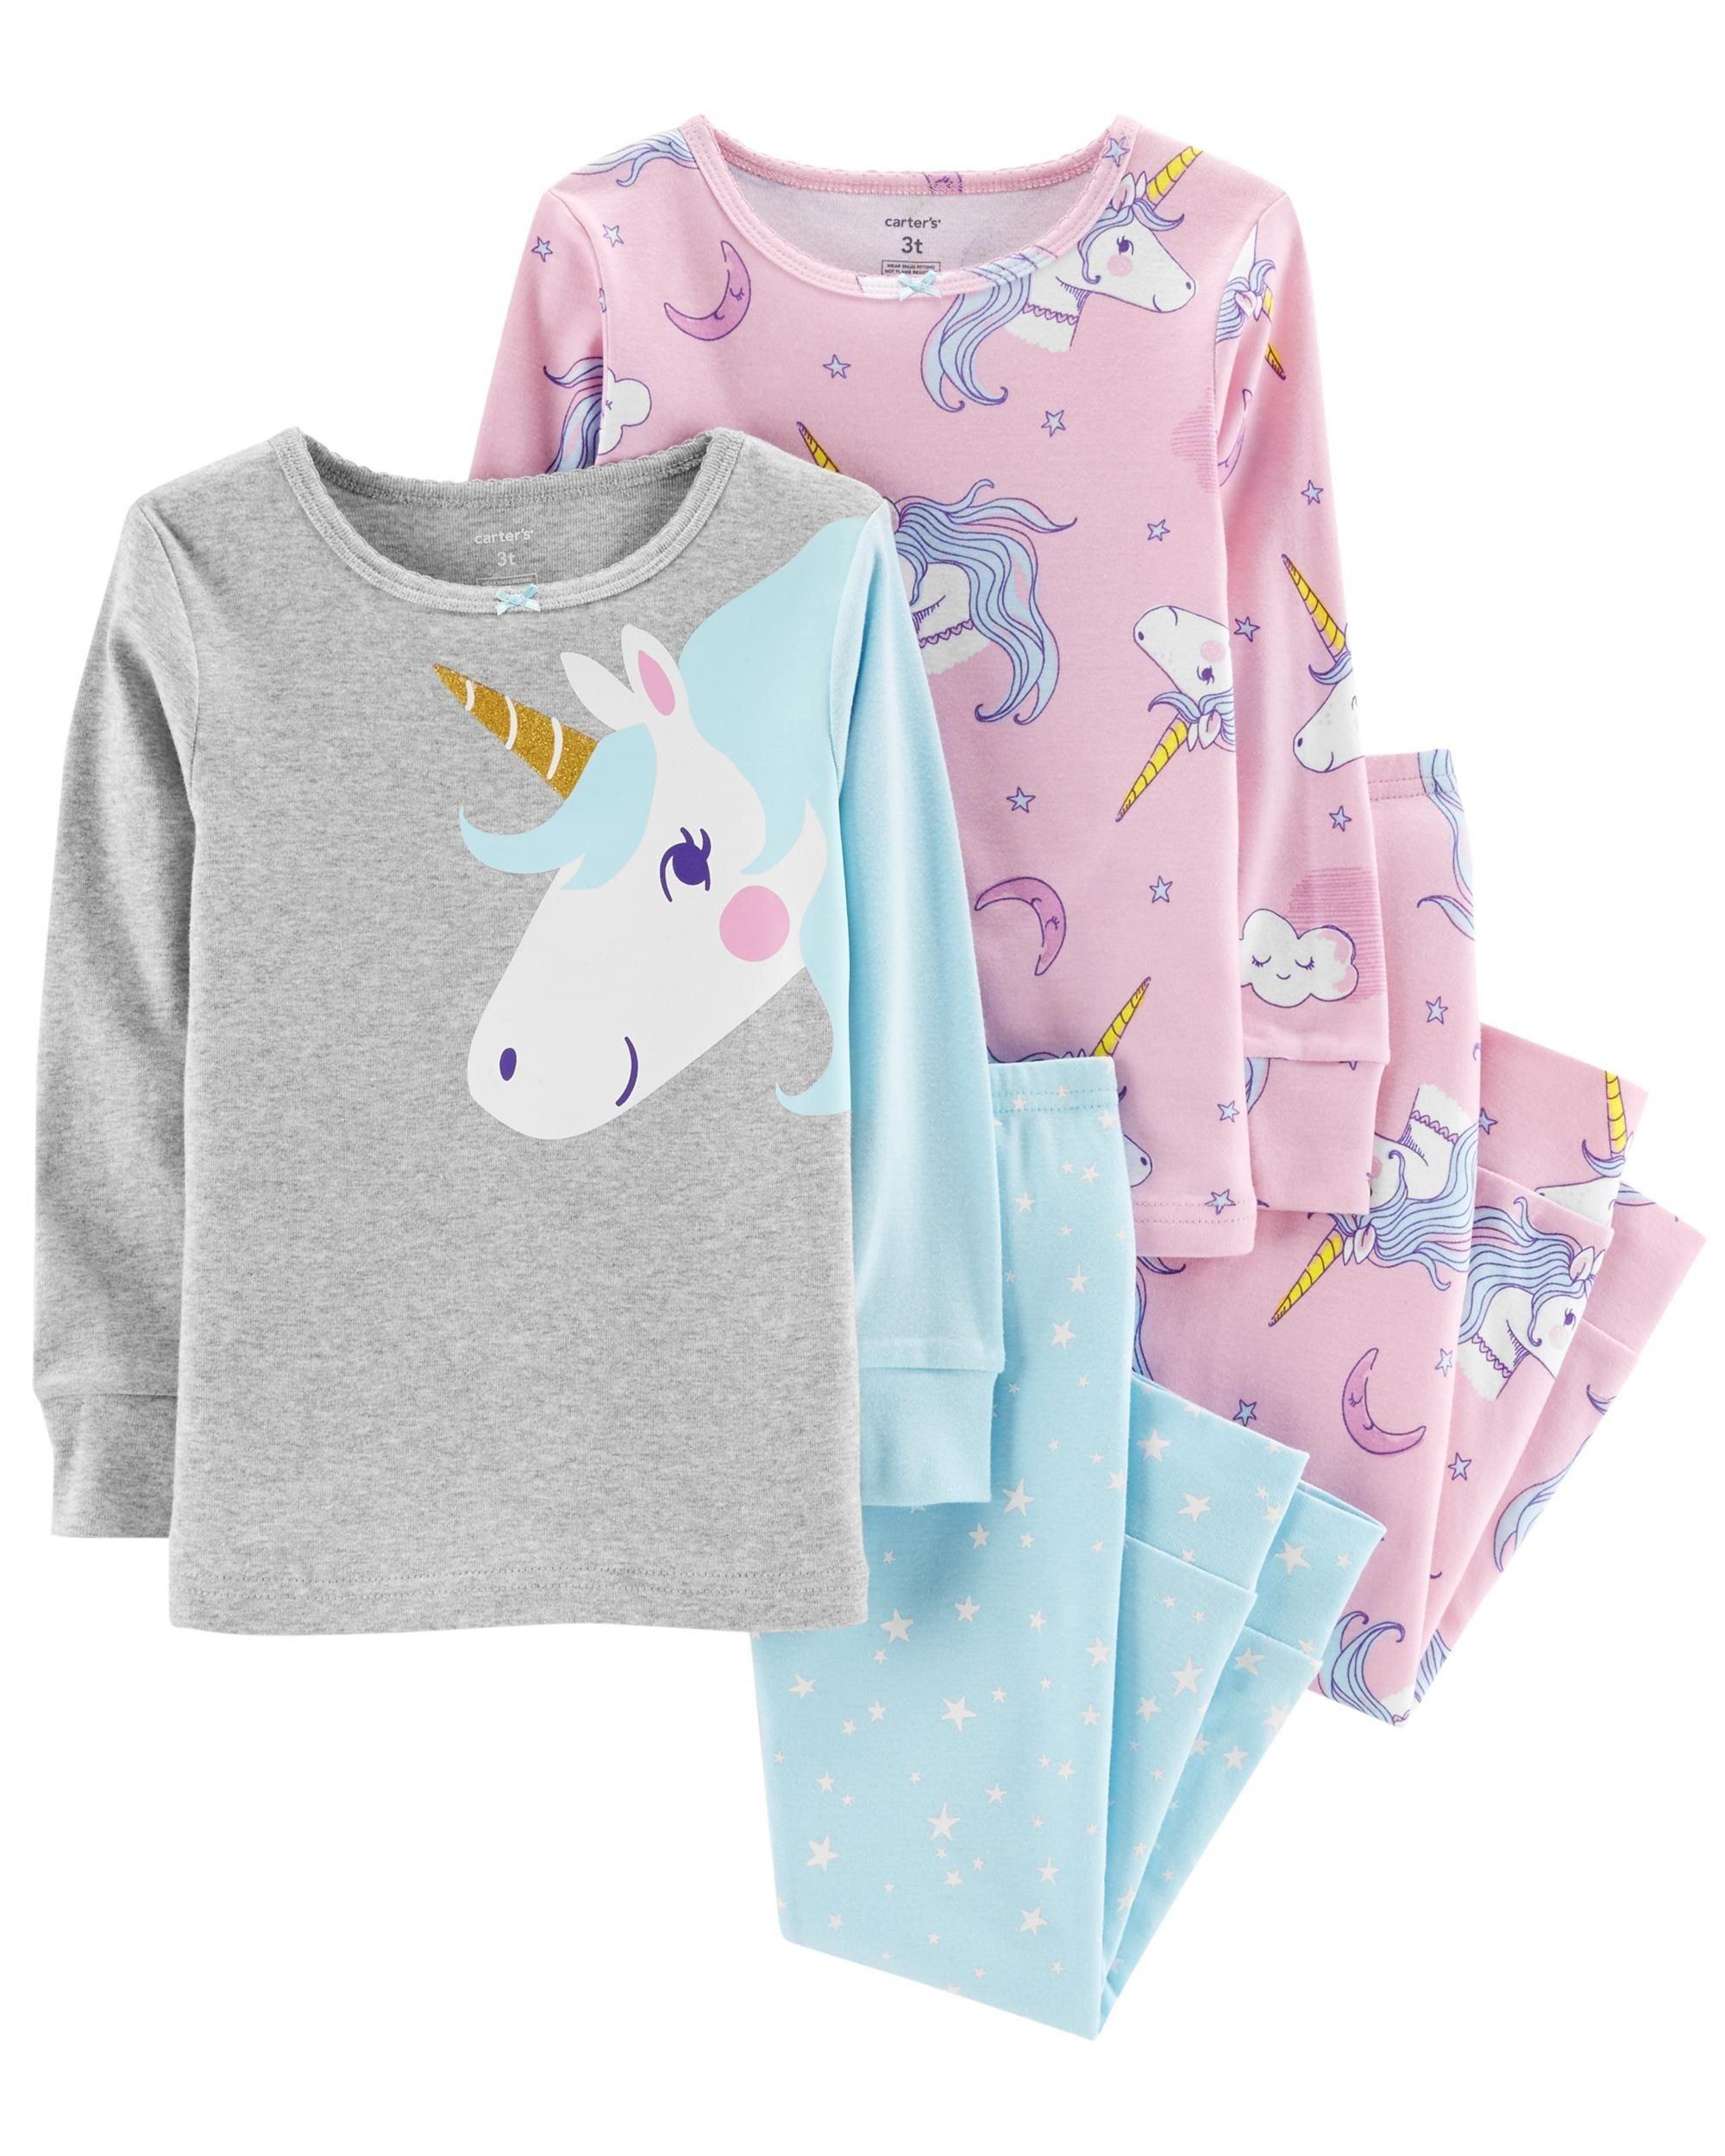 Carter's Girl's 4-Piece Snug Fit Cotton PJ Set, Unicorn, 5T